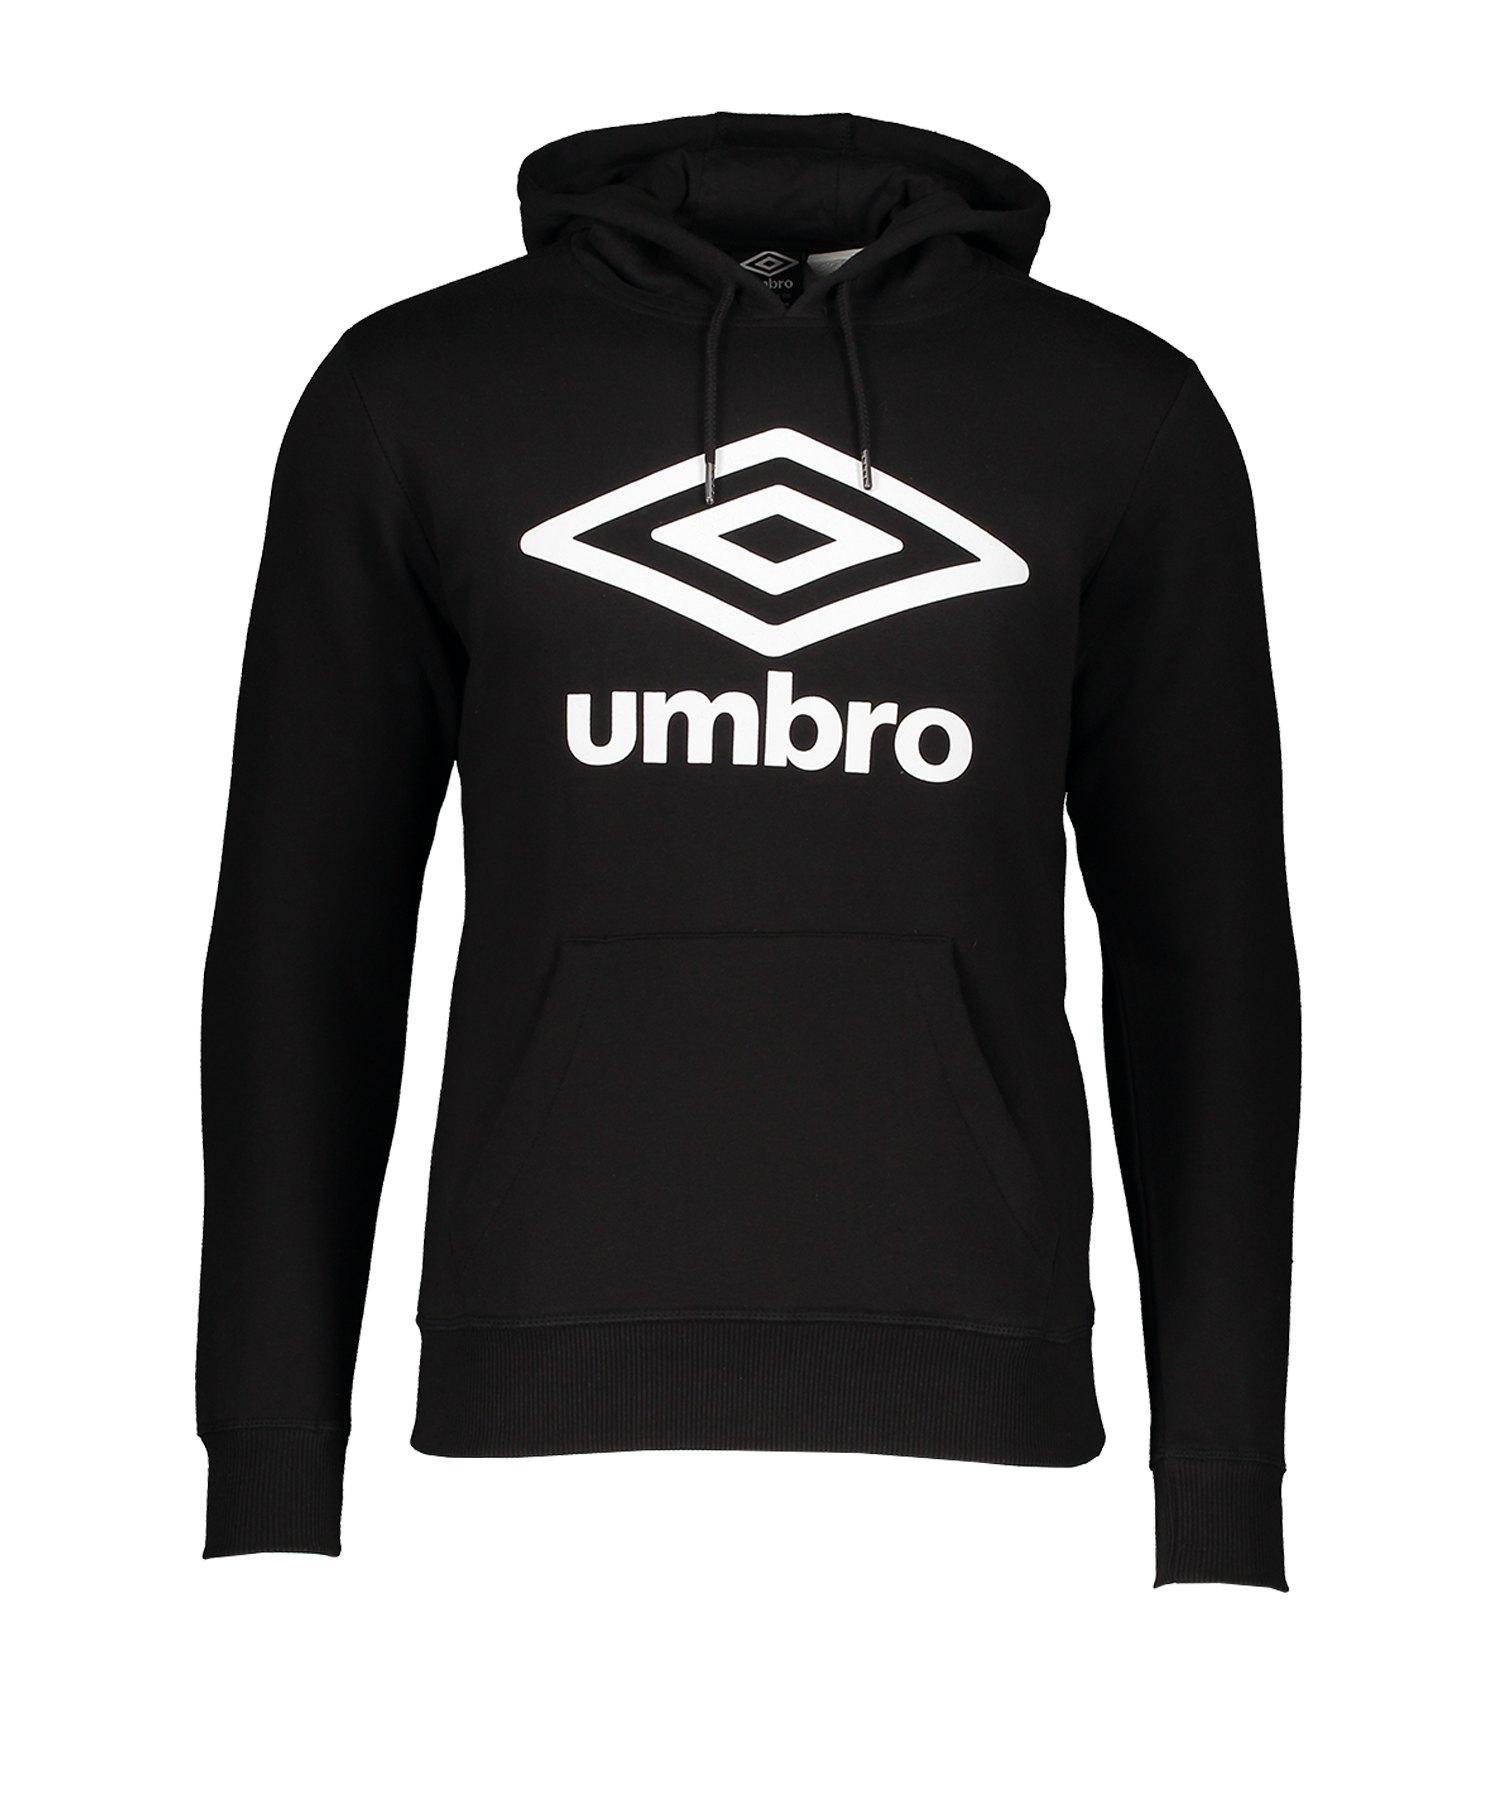 Umbro FW Large Logo Kapuzensweatshirt F060 - schwarz